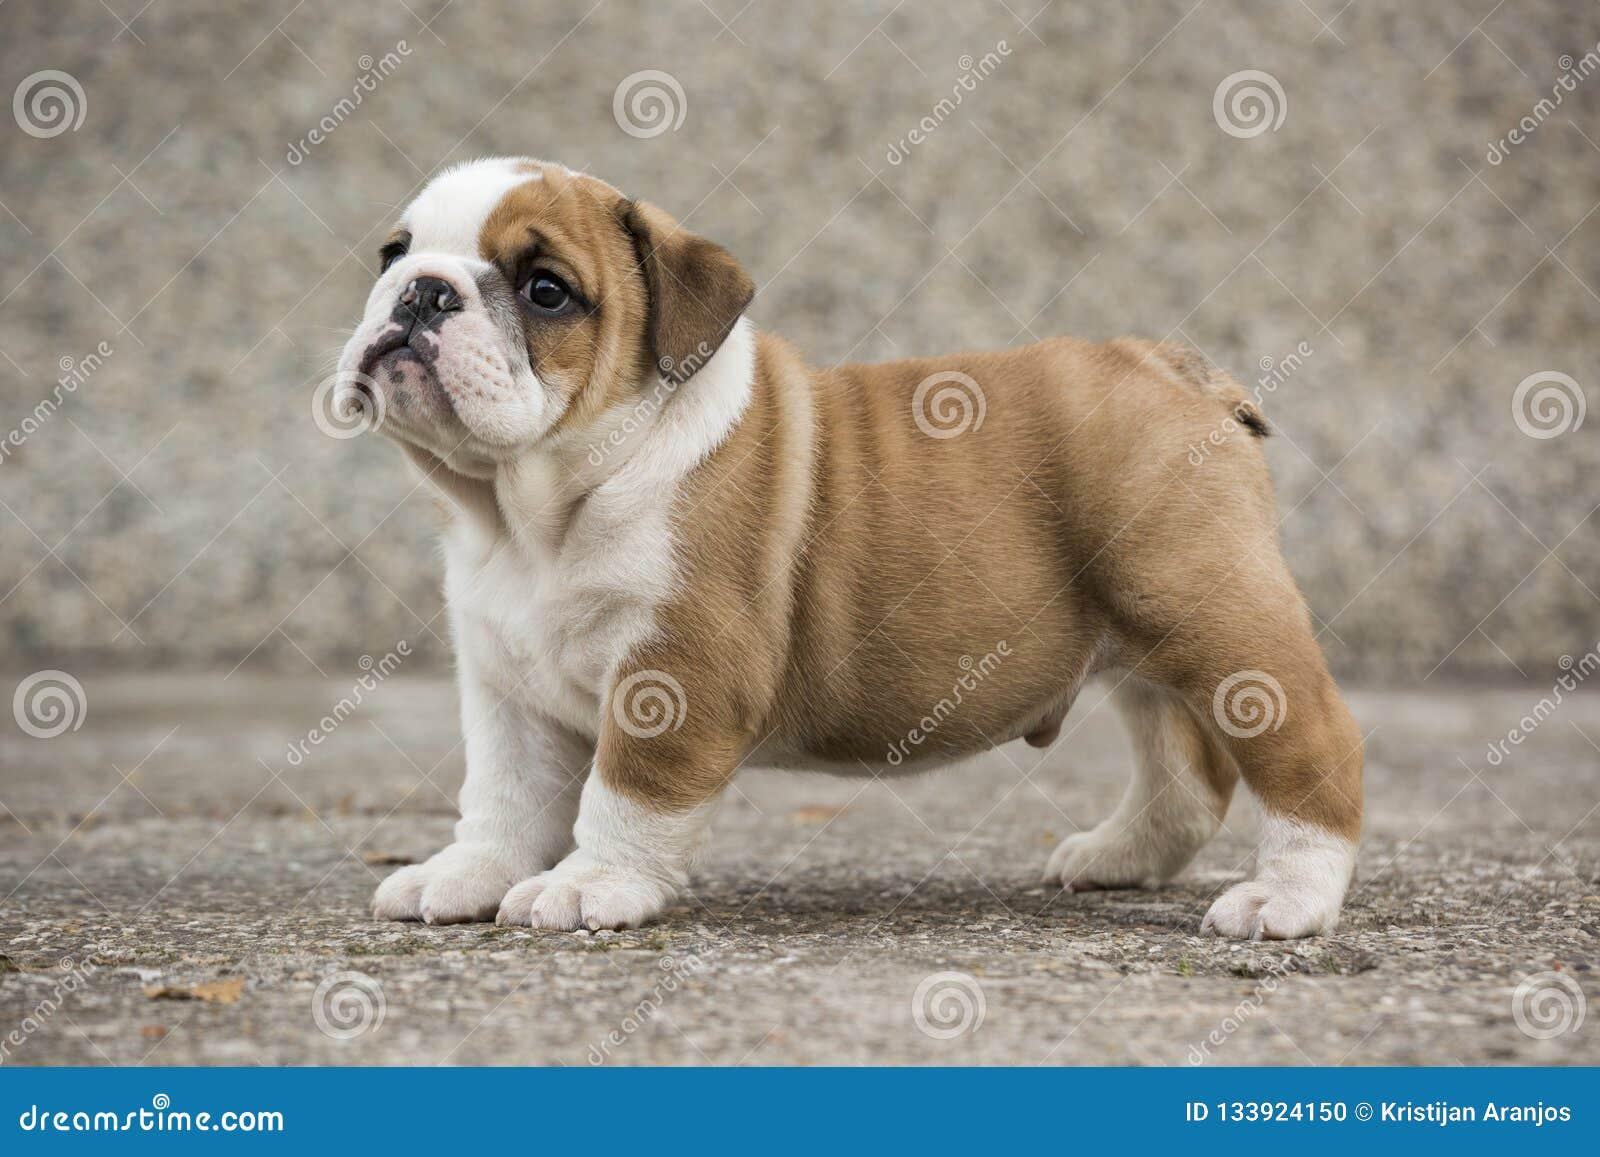 Cute English Bulldog Puppies Backyard Stock Photo Image Of Bulldogs Paws 133924150